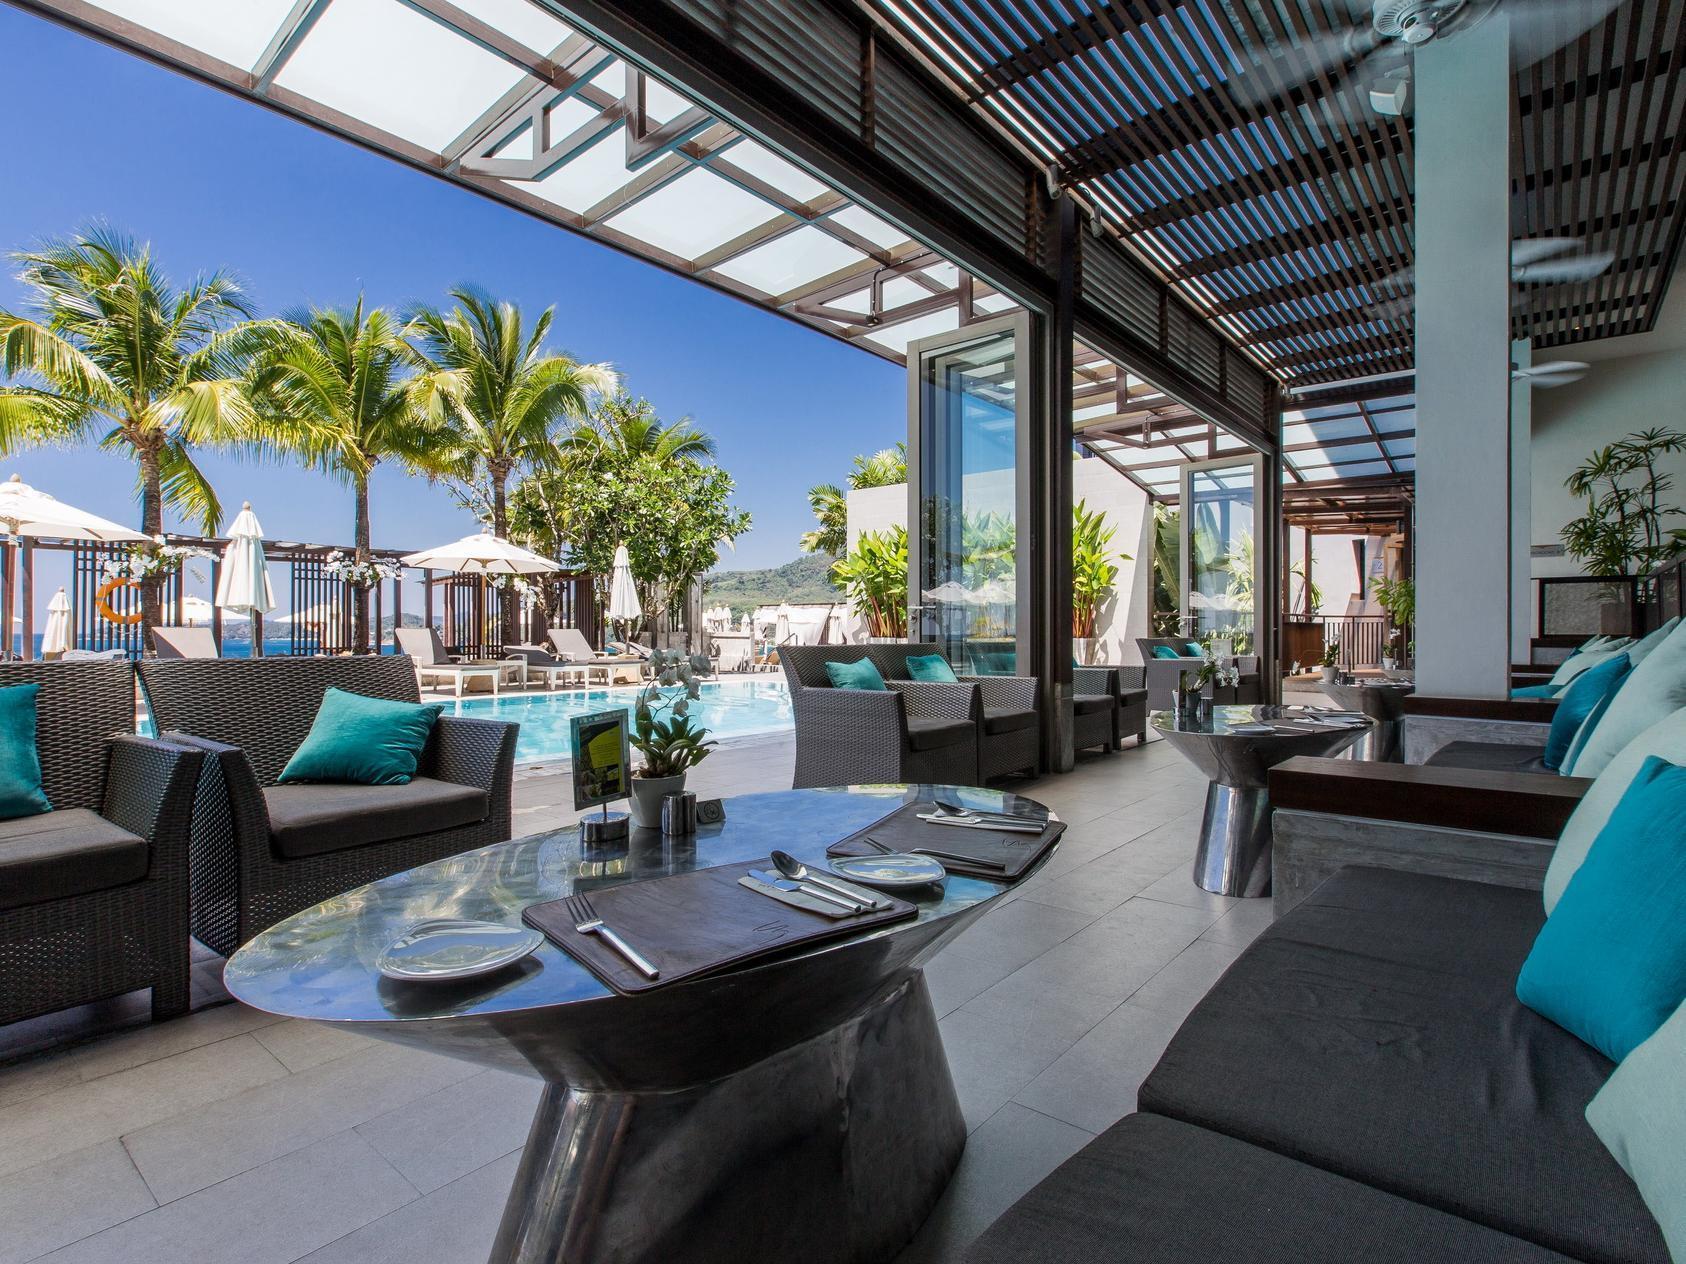 Cape Sienna Phuket Hotel and Villas7